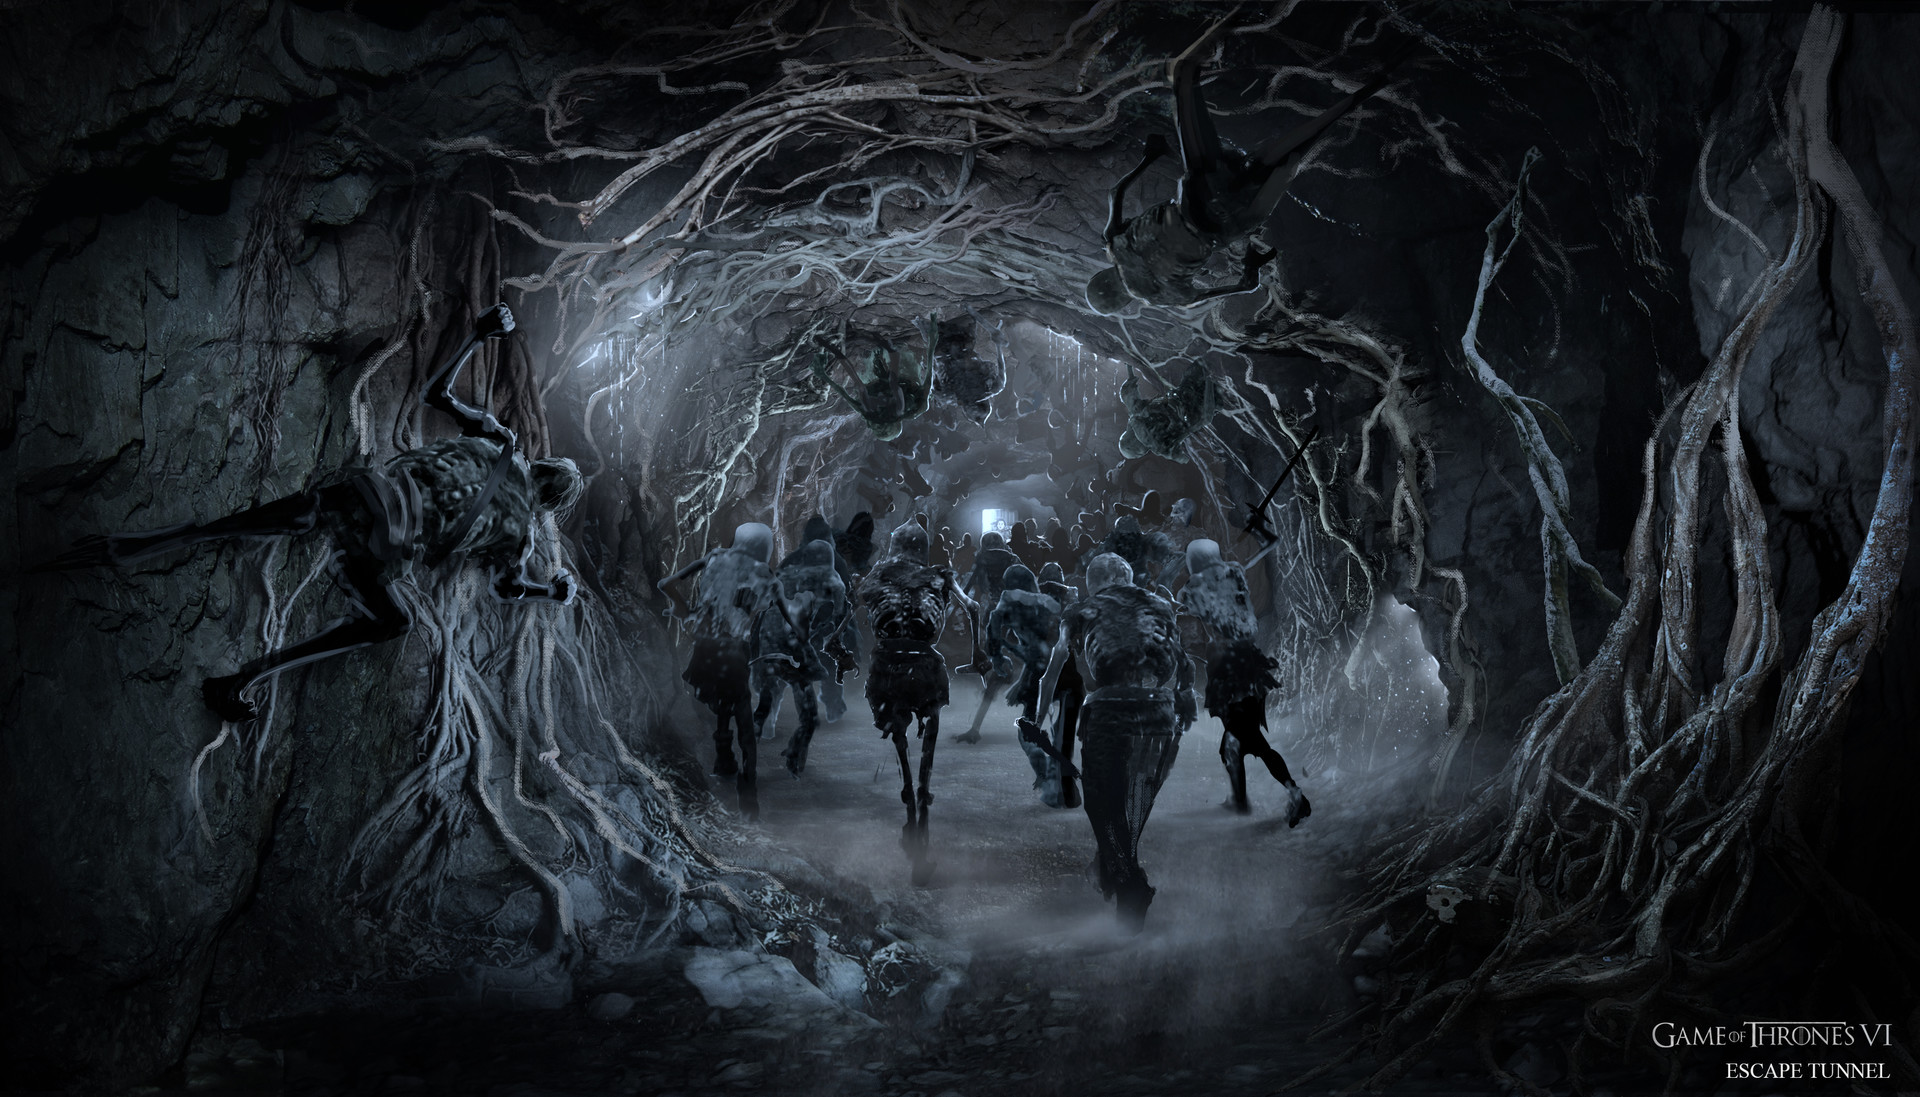 kieran-belshaw-escapetunnel-meerasview-v